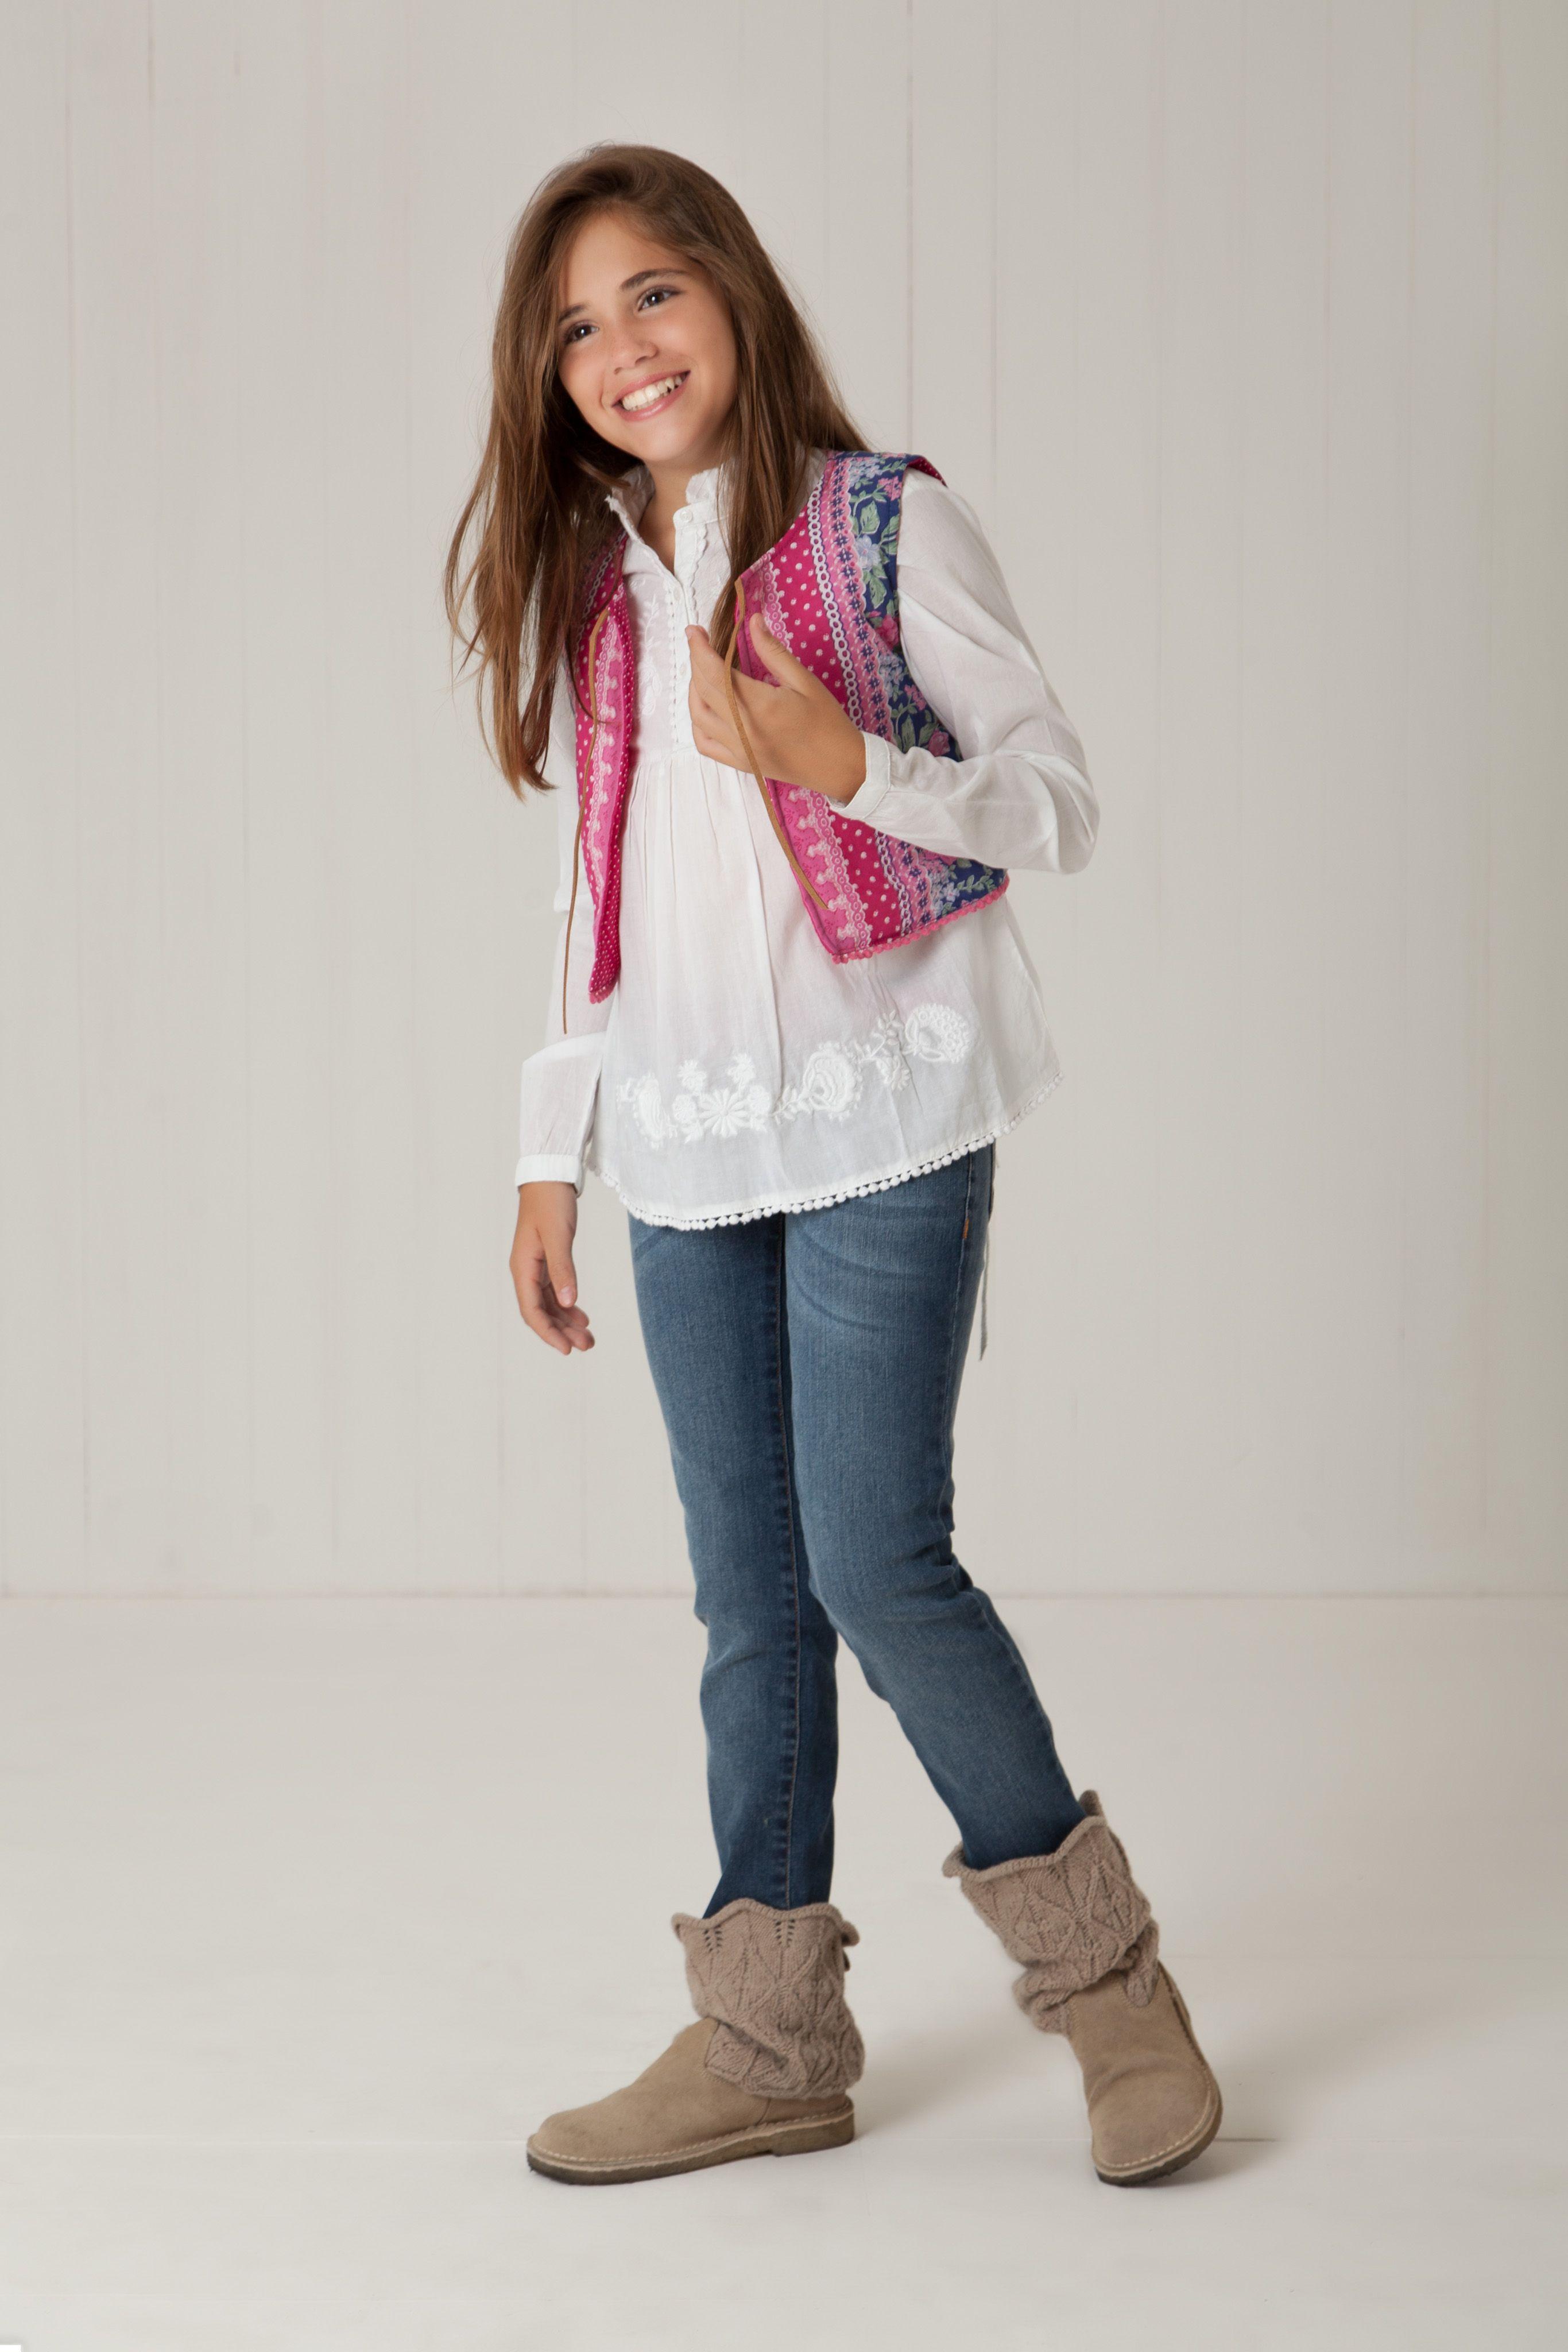 Lookbook Junior Girls - Mimo & Co | Lookbook Junior Girls ...